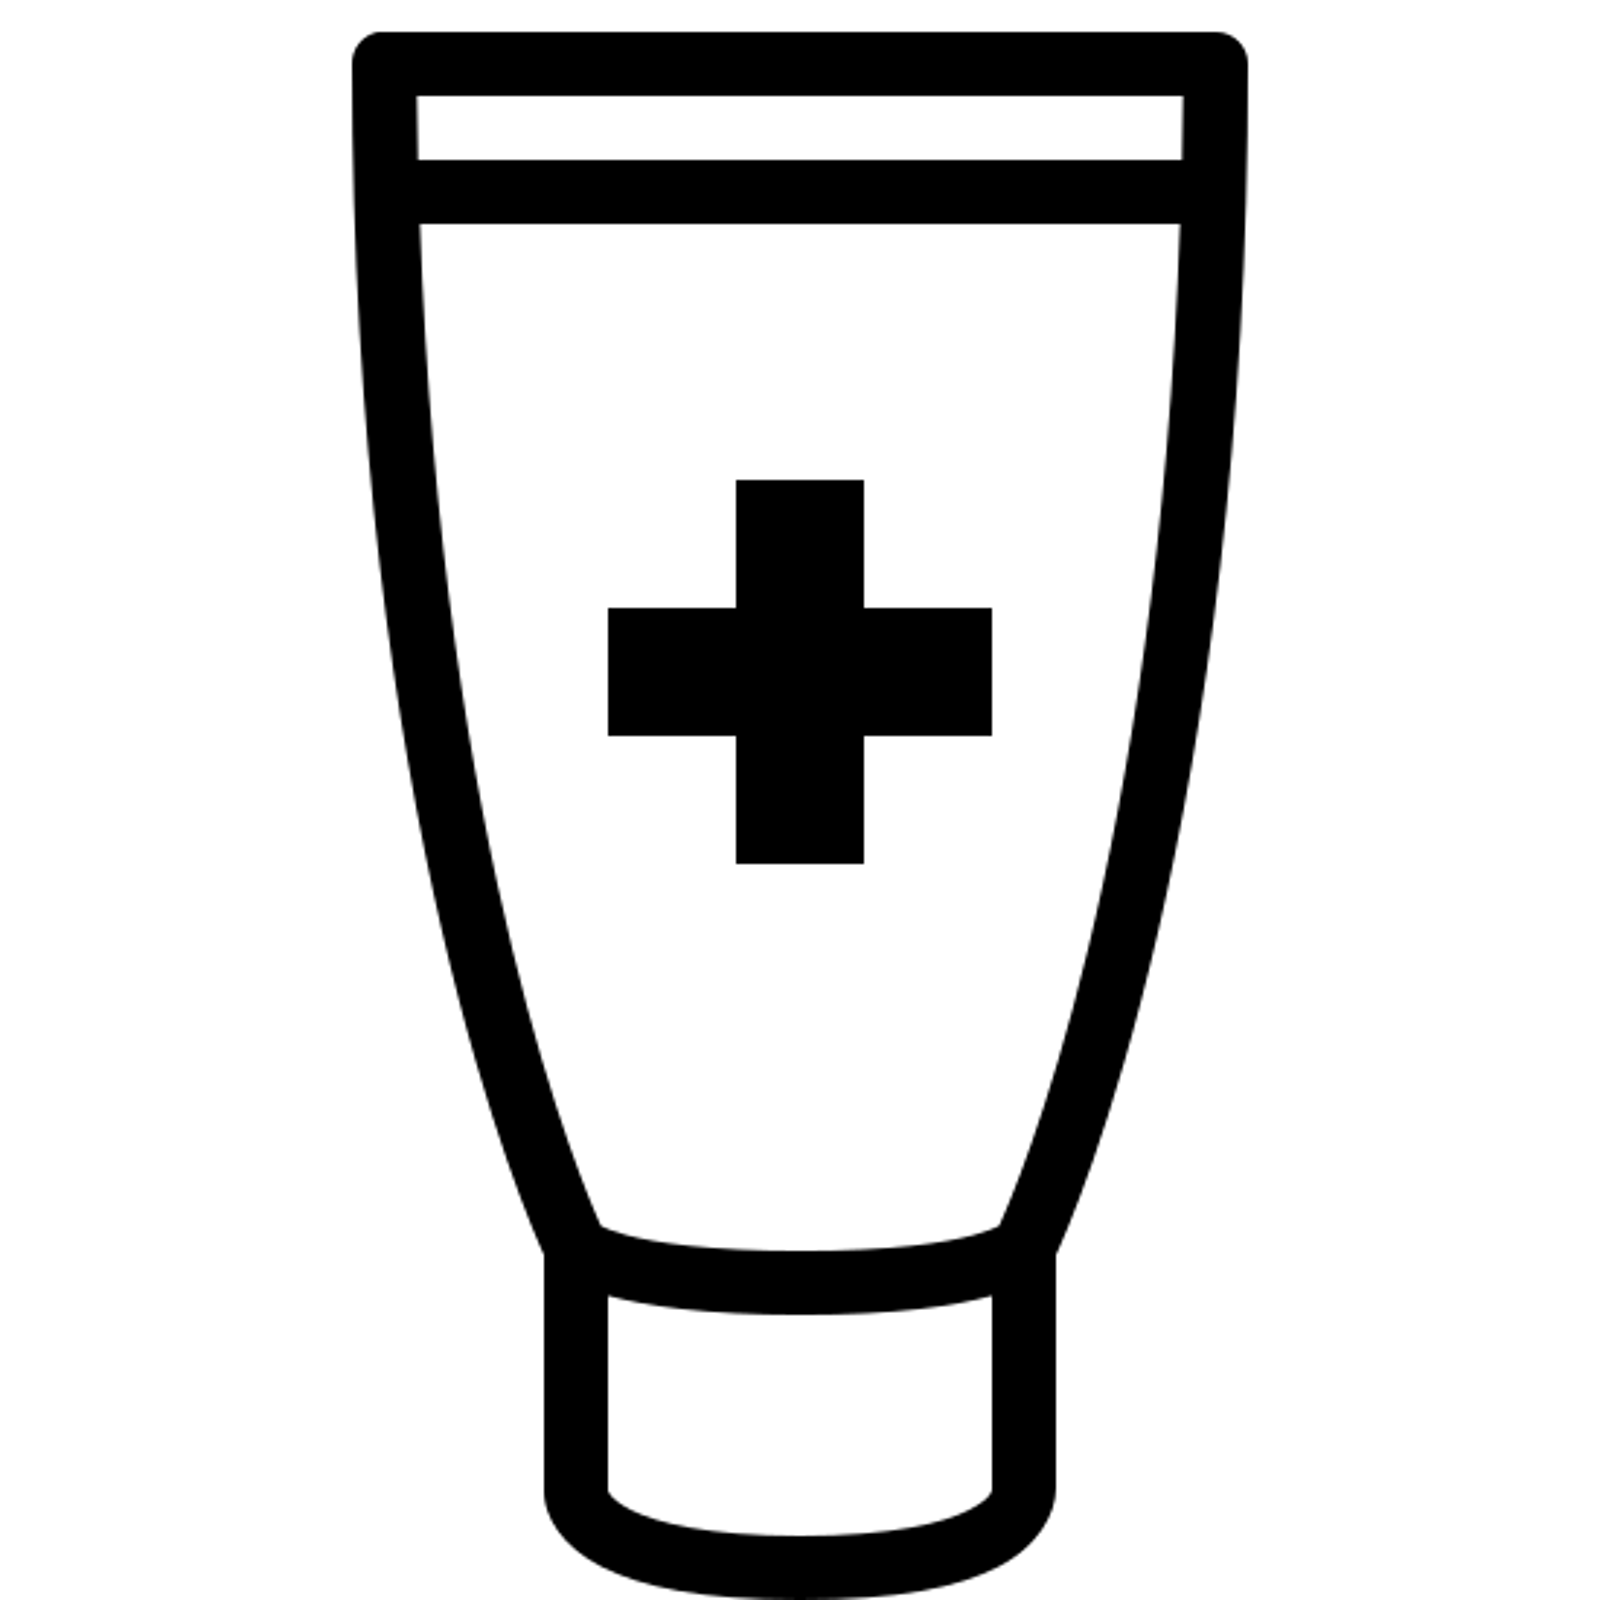 Crema Antiseptica Icono